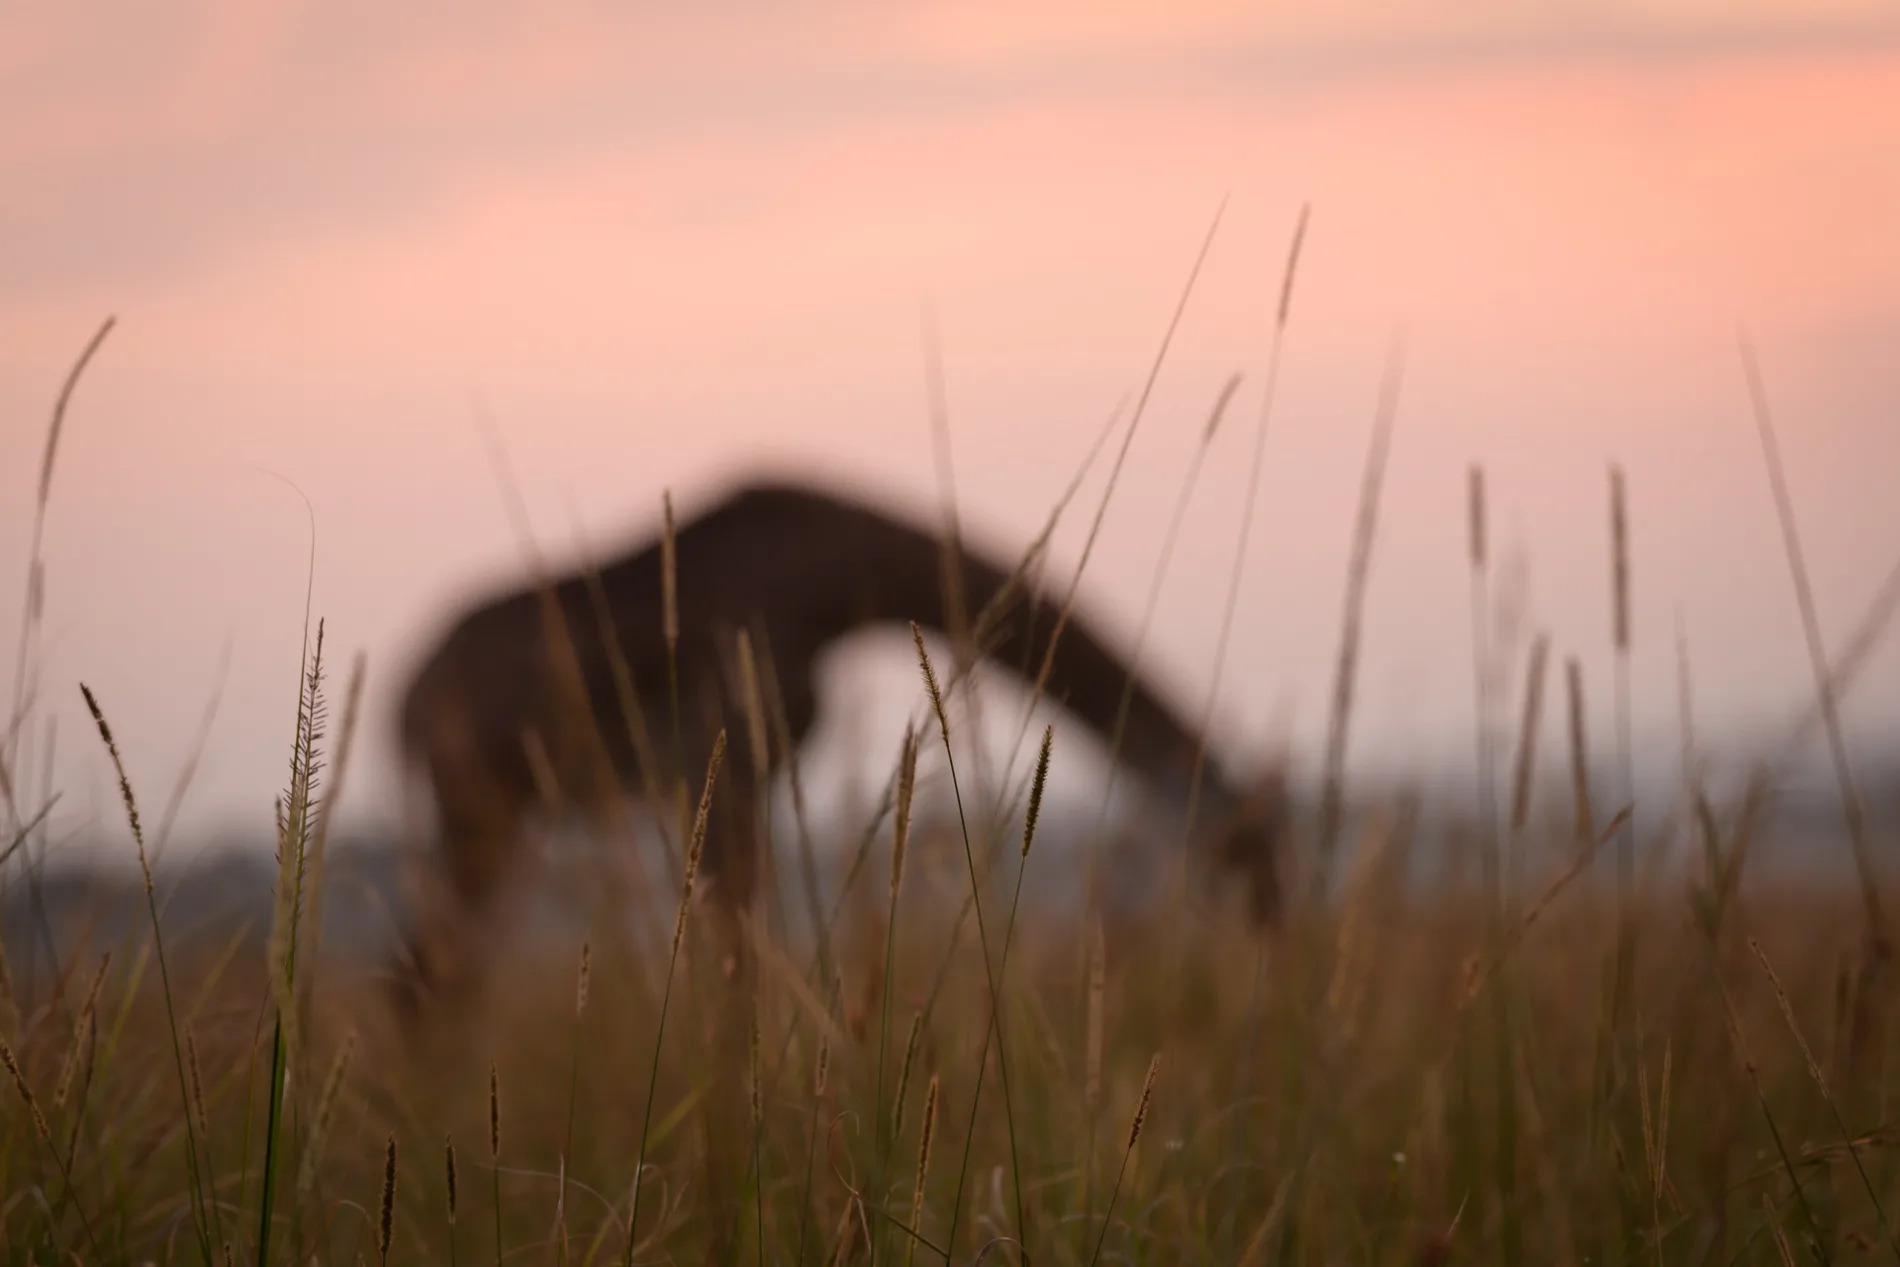 blurred giraffe